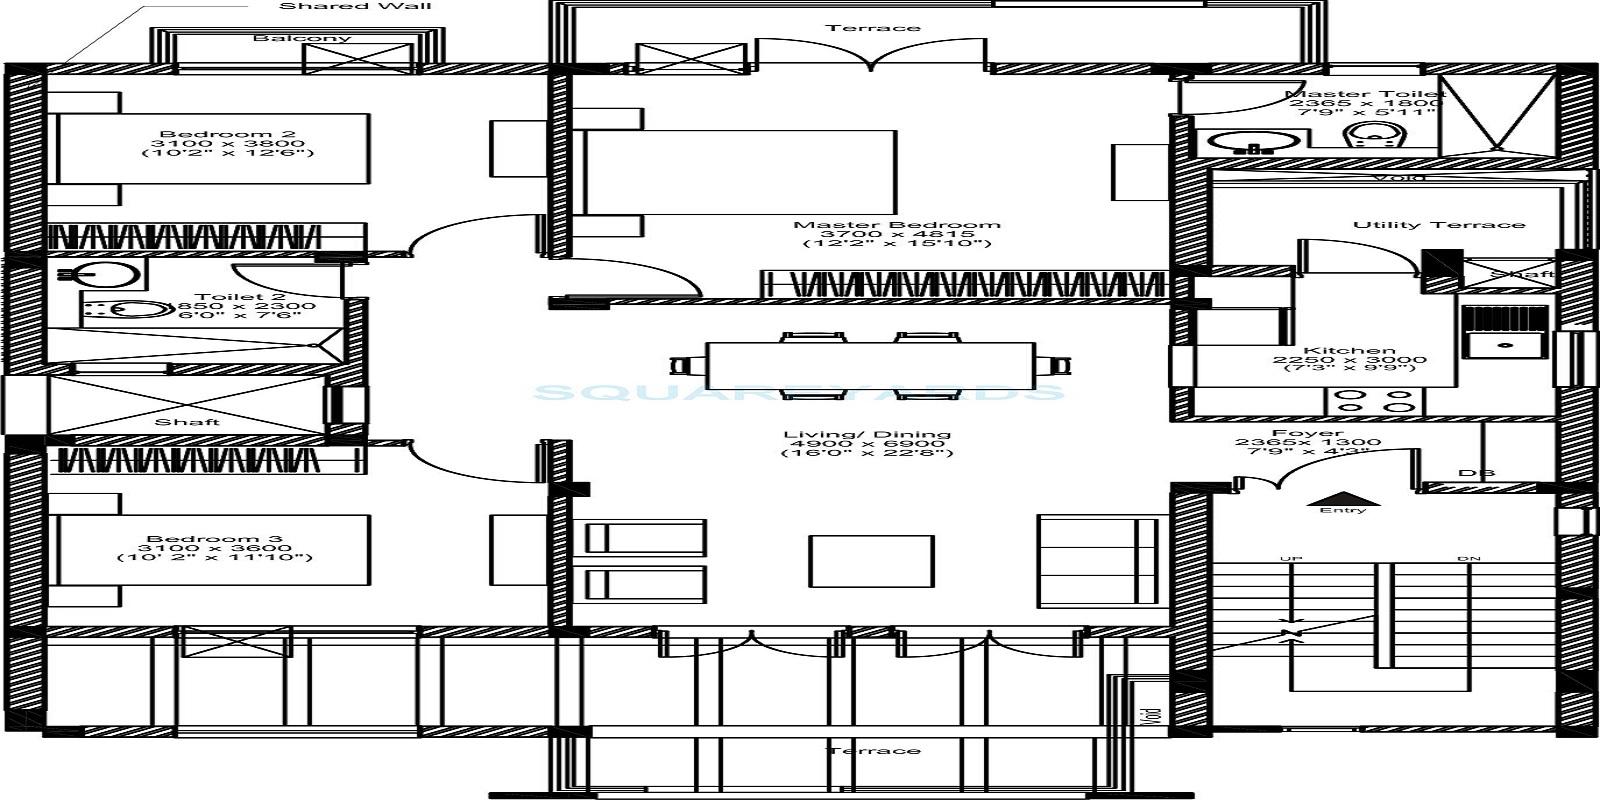 vatika inxt floors ind floor 3bhk 1386sqft 91